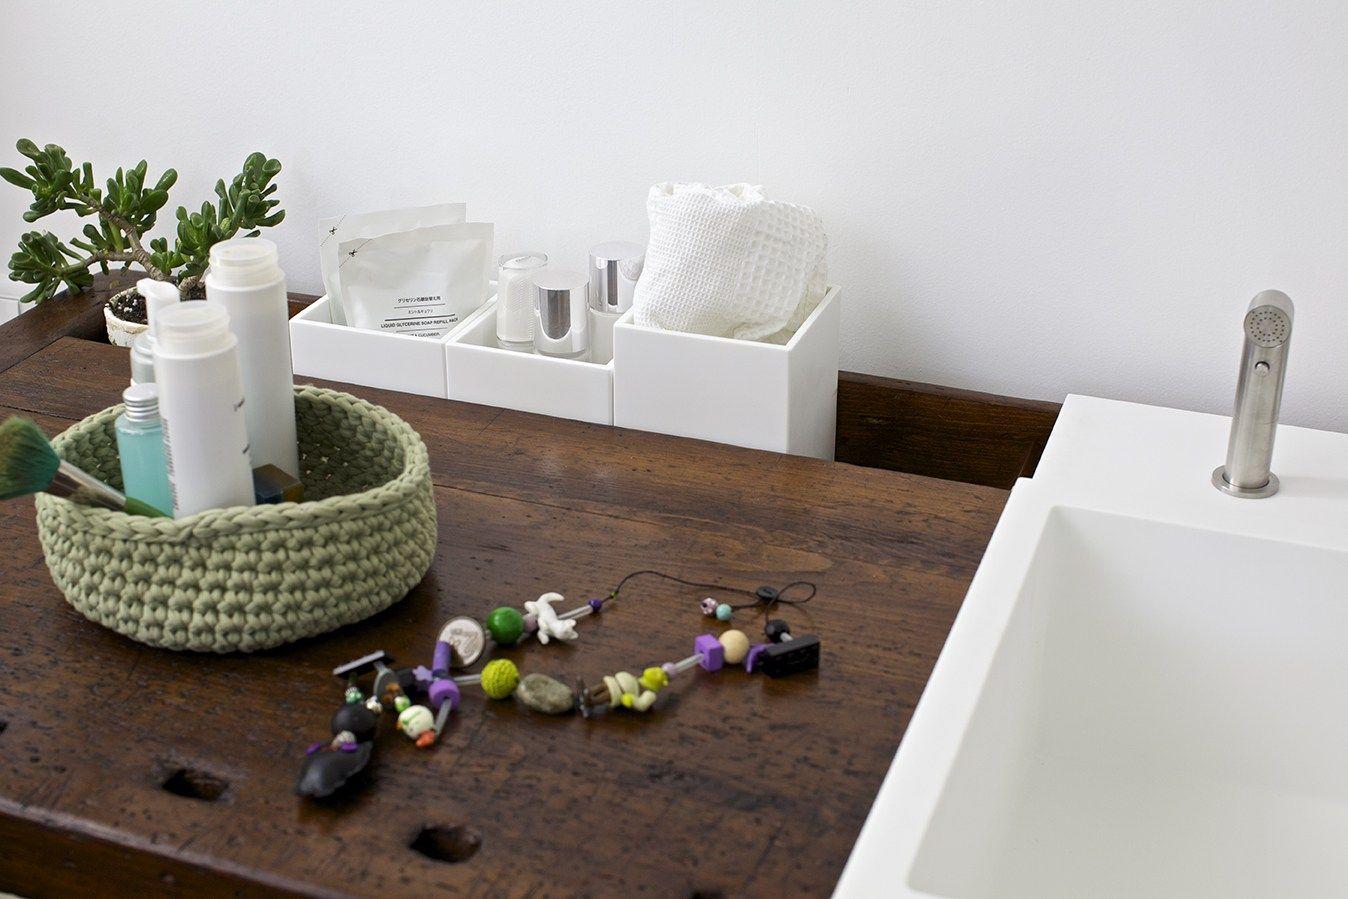 Waschtischunterschrank aus Holz TAUL By Rexa Design Design ... | {Waschtischunterschrank design 93}